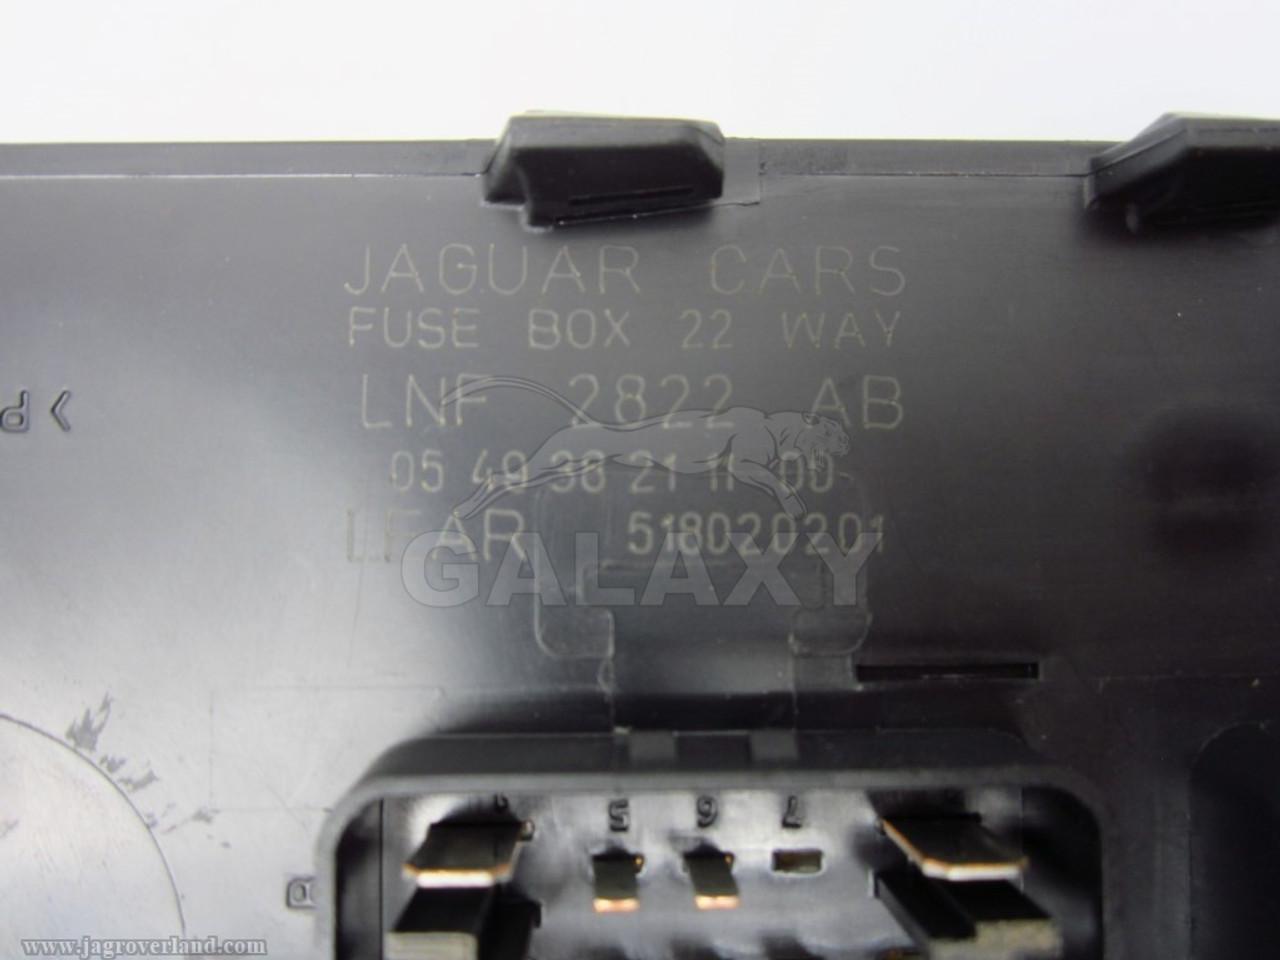 98 03 xj8 trunk mounted rear fuse box module lnf2822ab [ 1280 x 960 Pixel ]